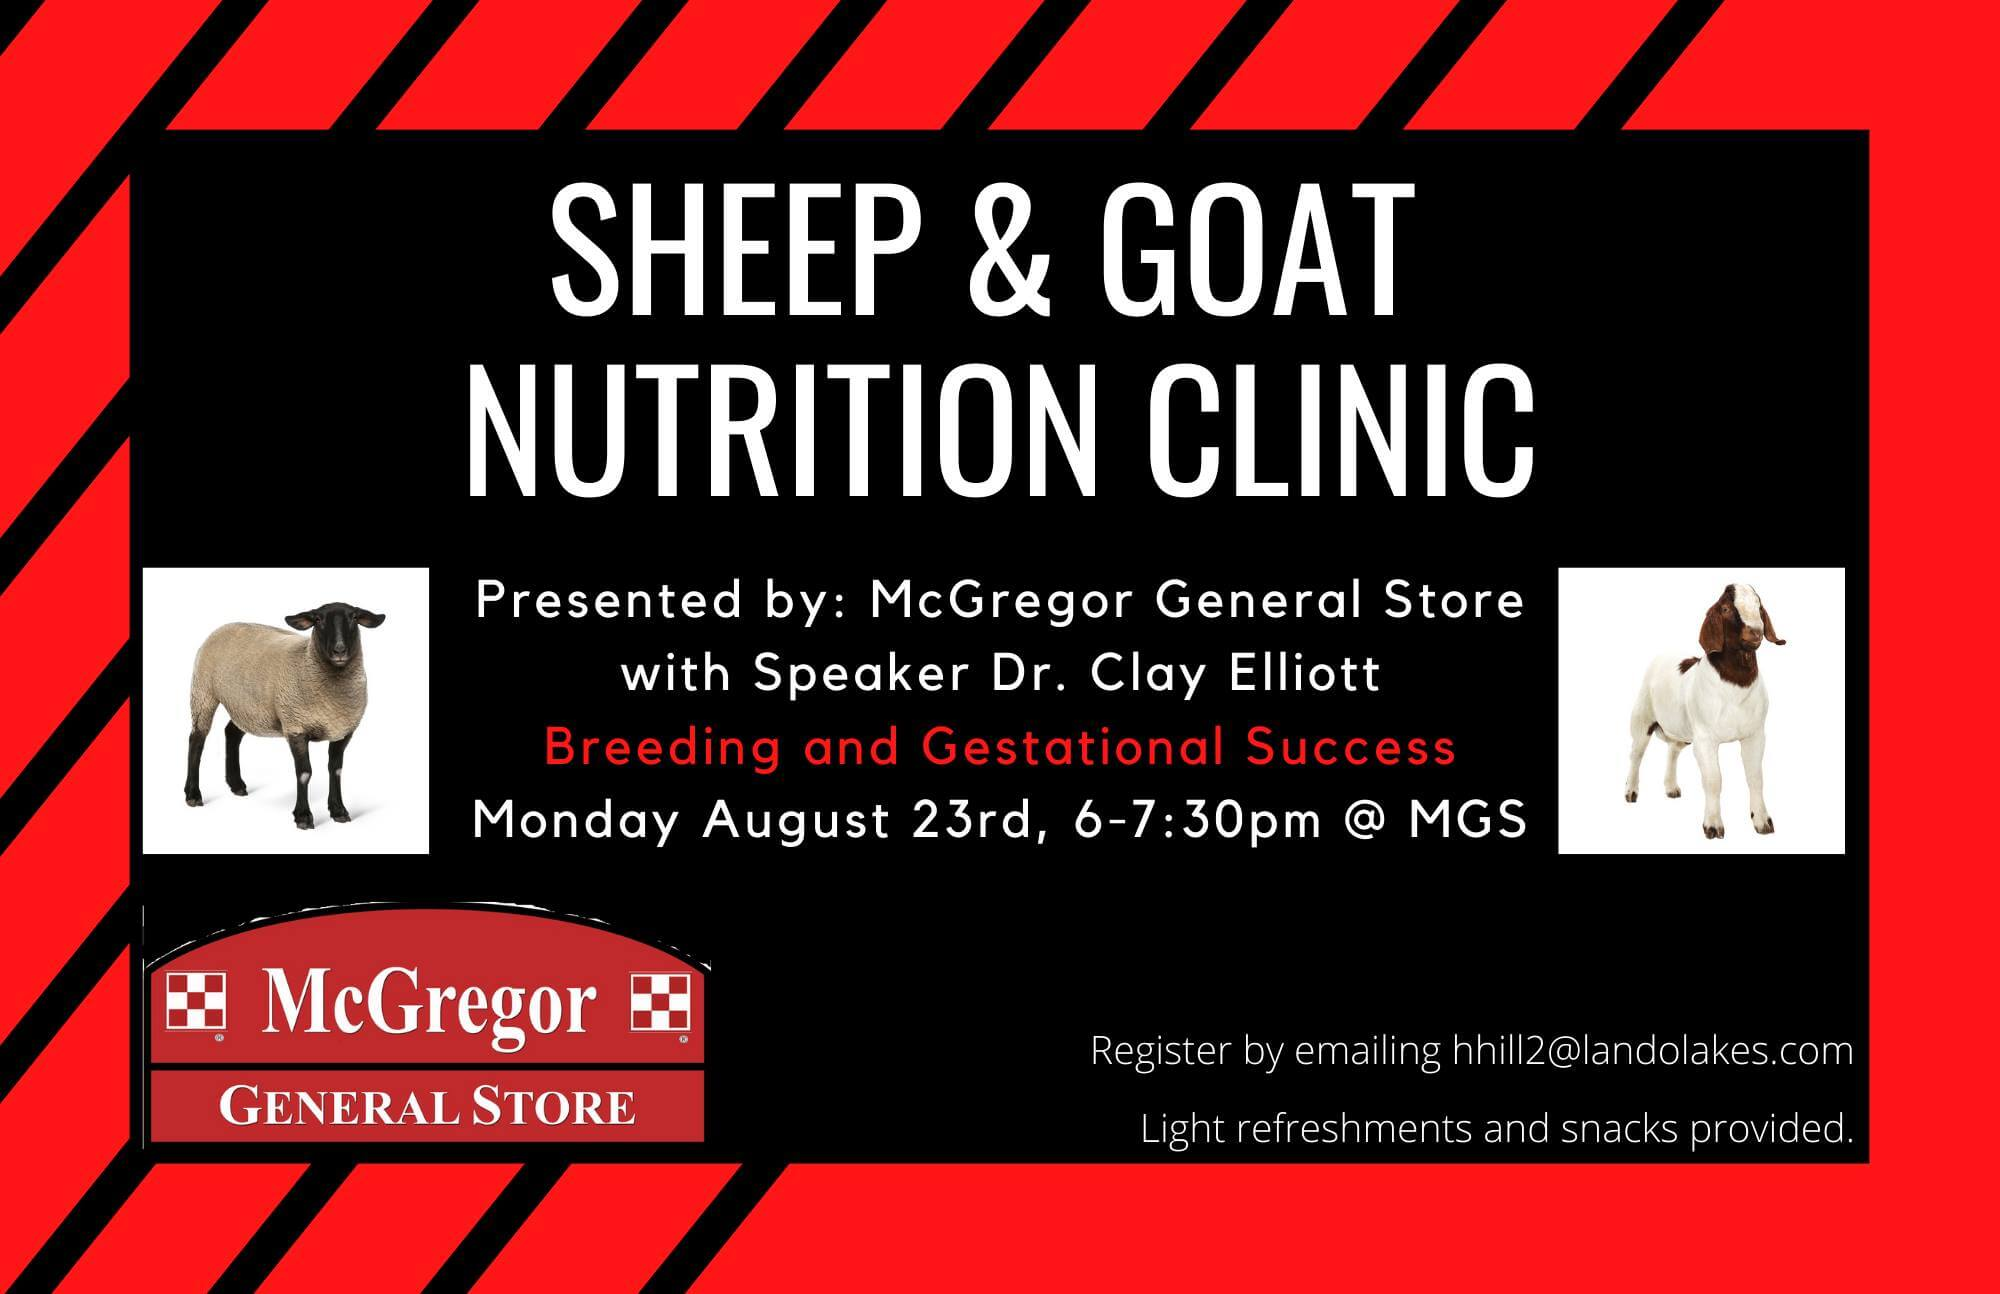 sheep goat nutrition clinic clay elliott purina animal nutrition